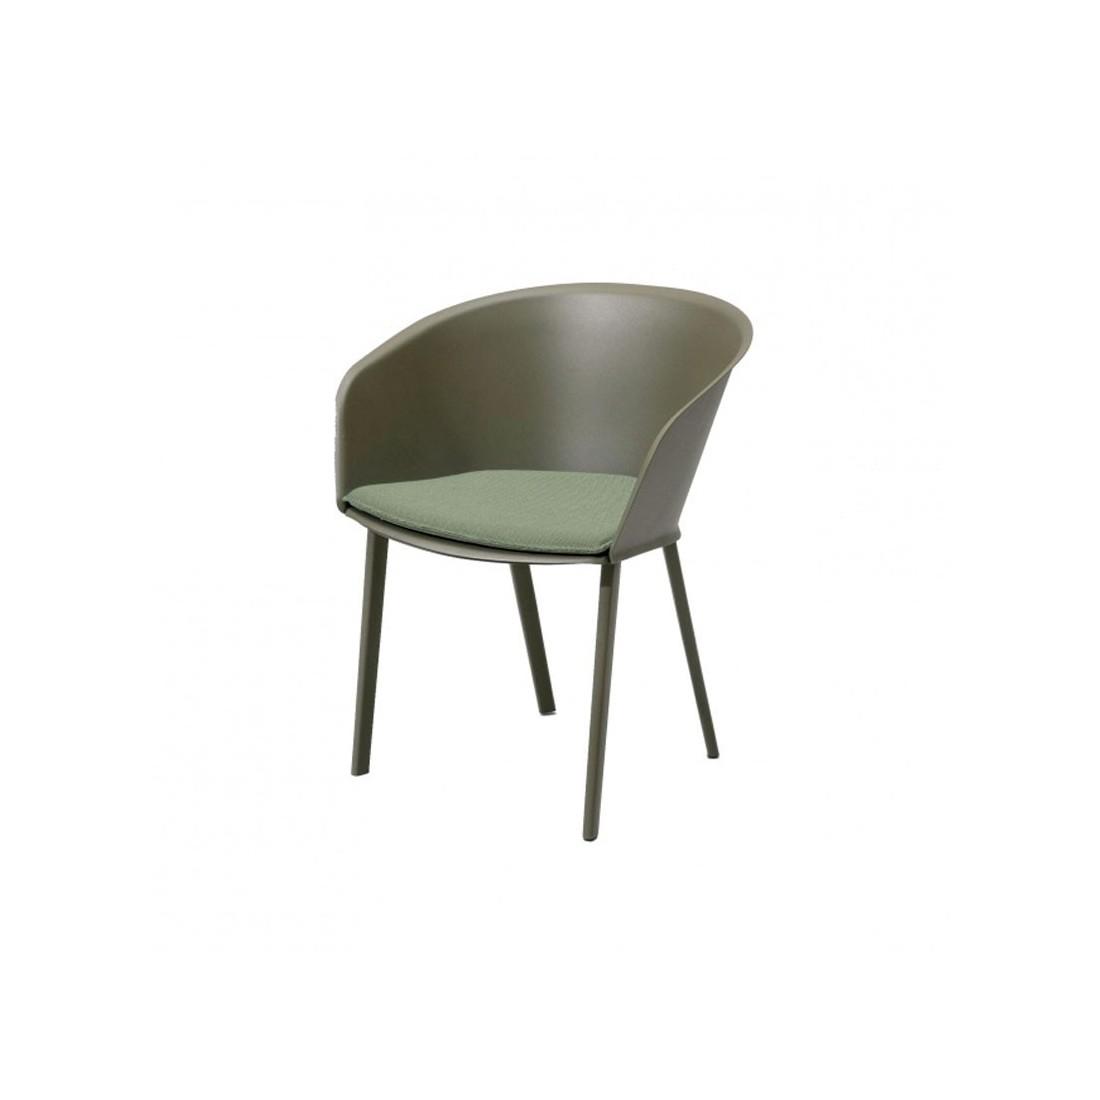 Chaise de jardin avec accoudoirs STAMPA Solid - KETTAL Kettal ...